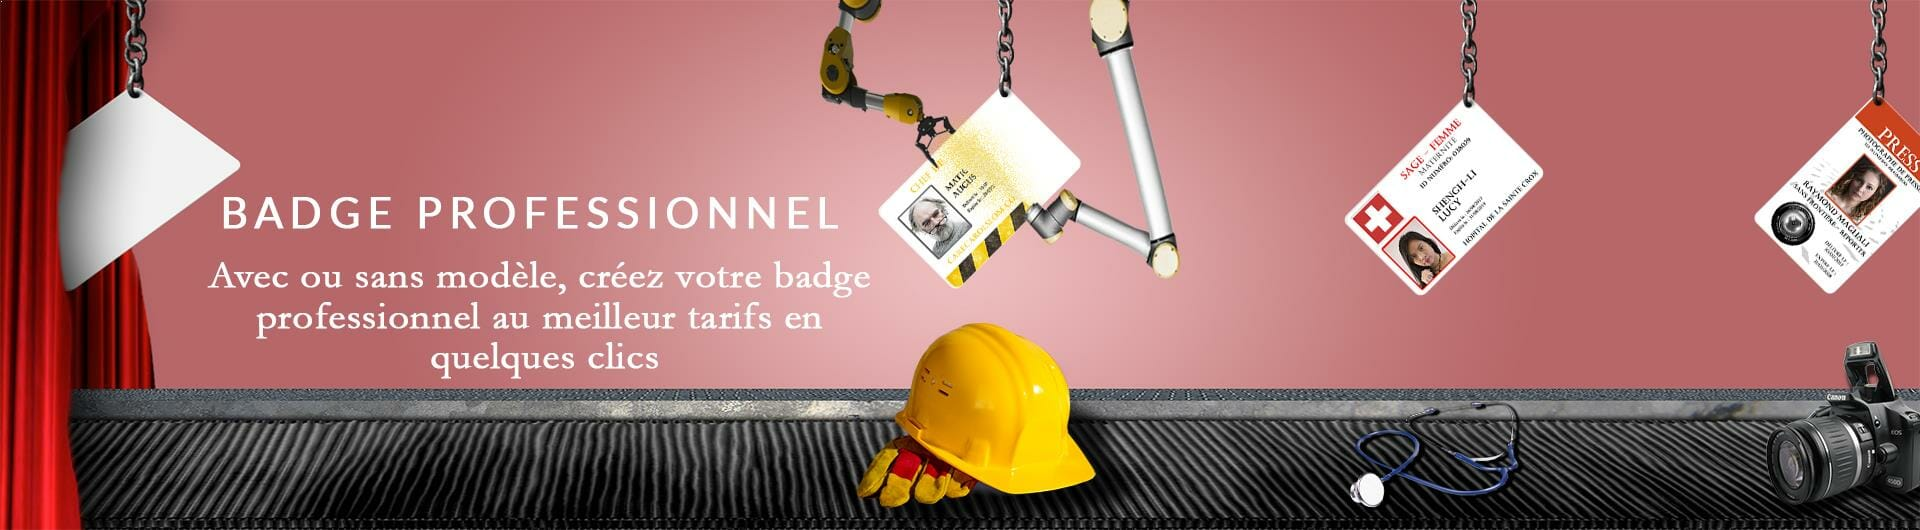 Porte badge professionnel nominatif chantier infirmière photographe cardzprinter